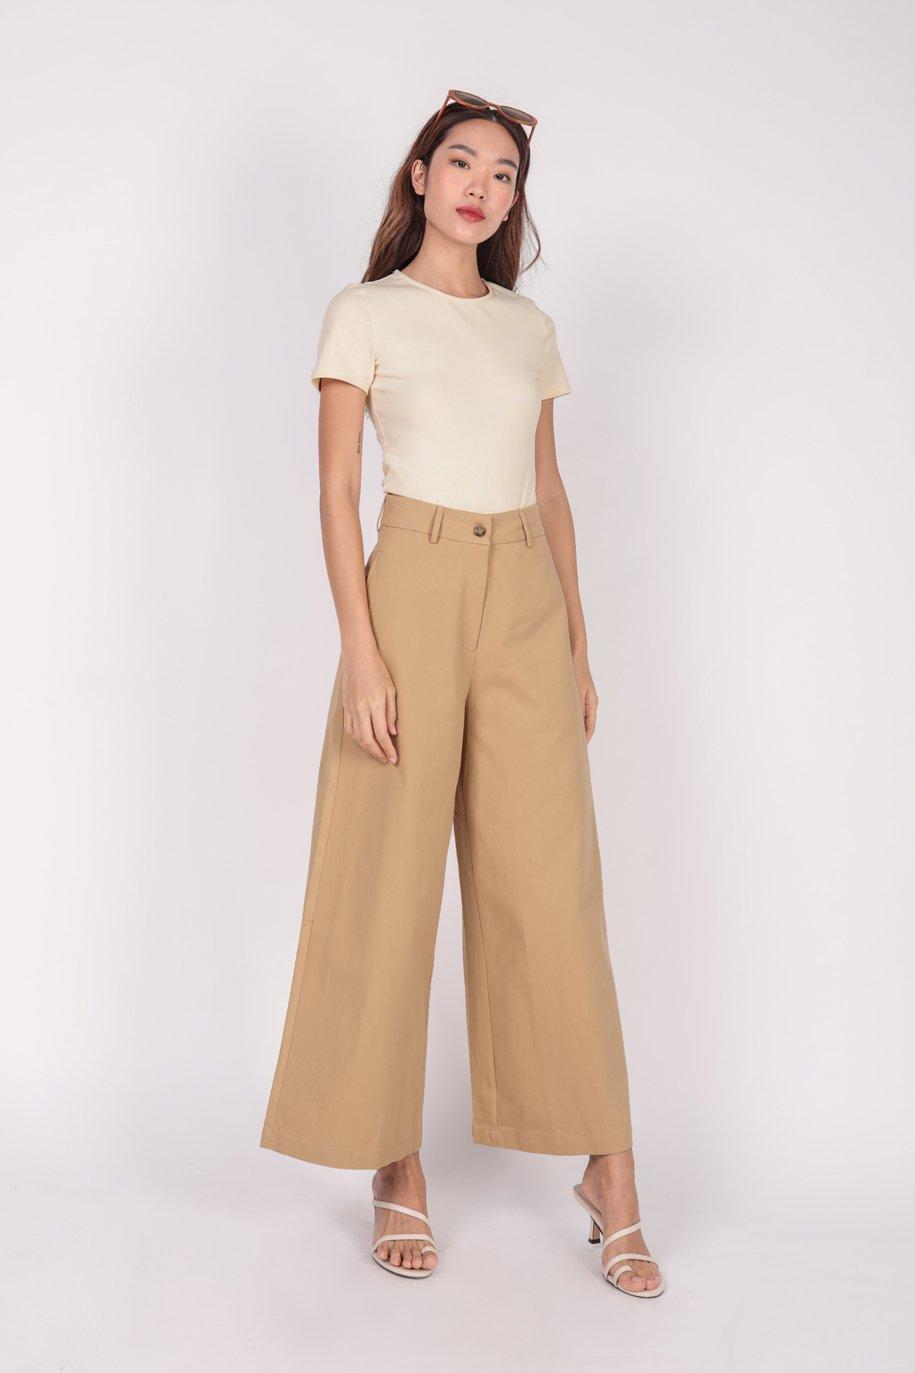 Karol Sleeved Bodysuit (Cream)